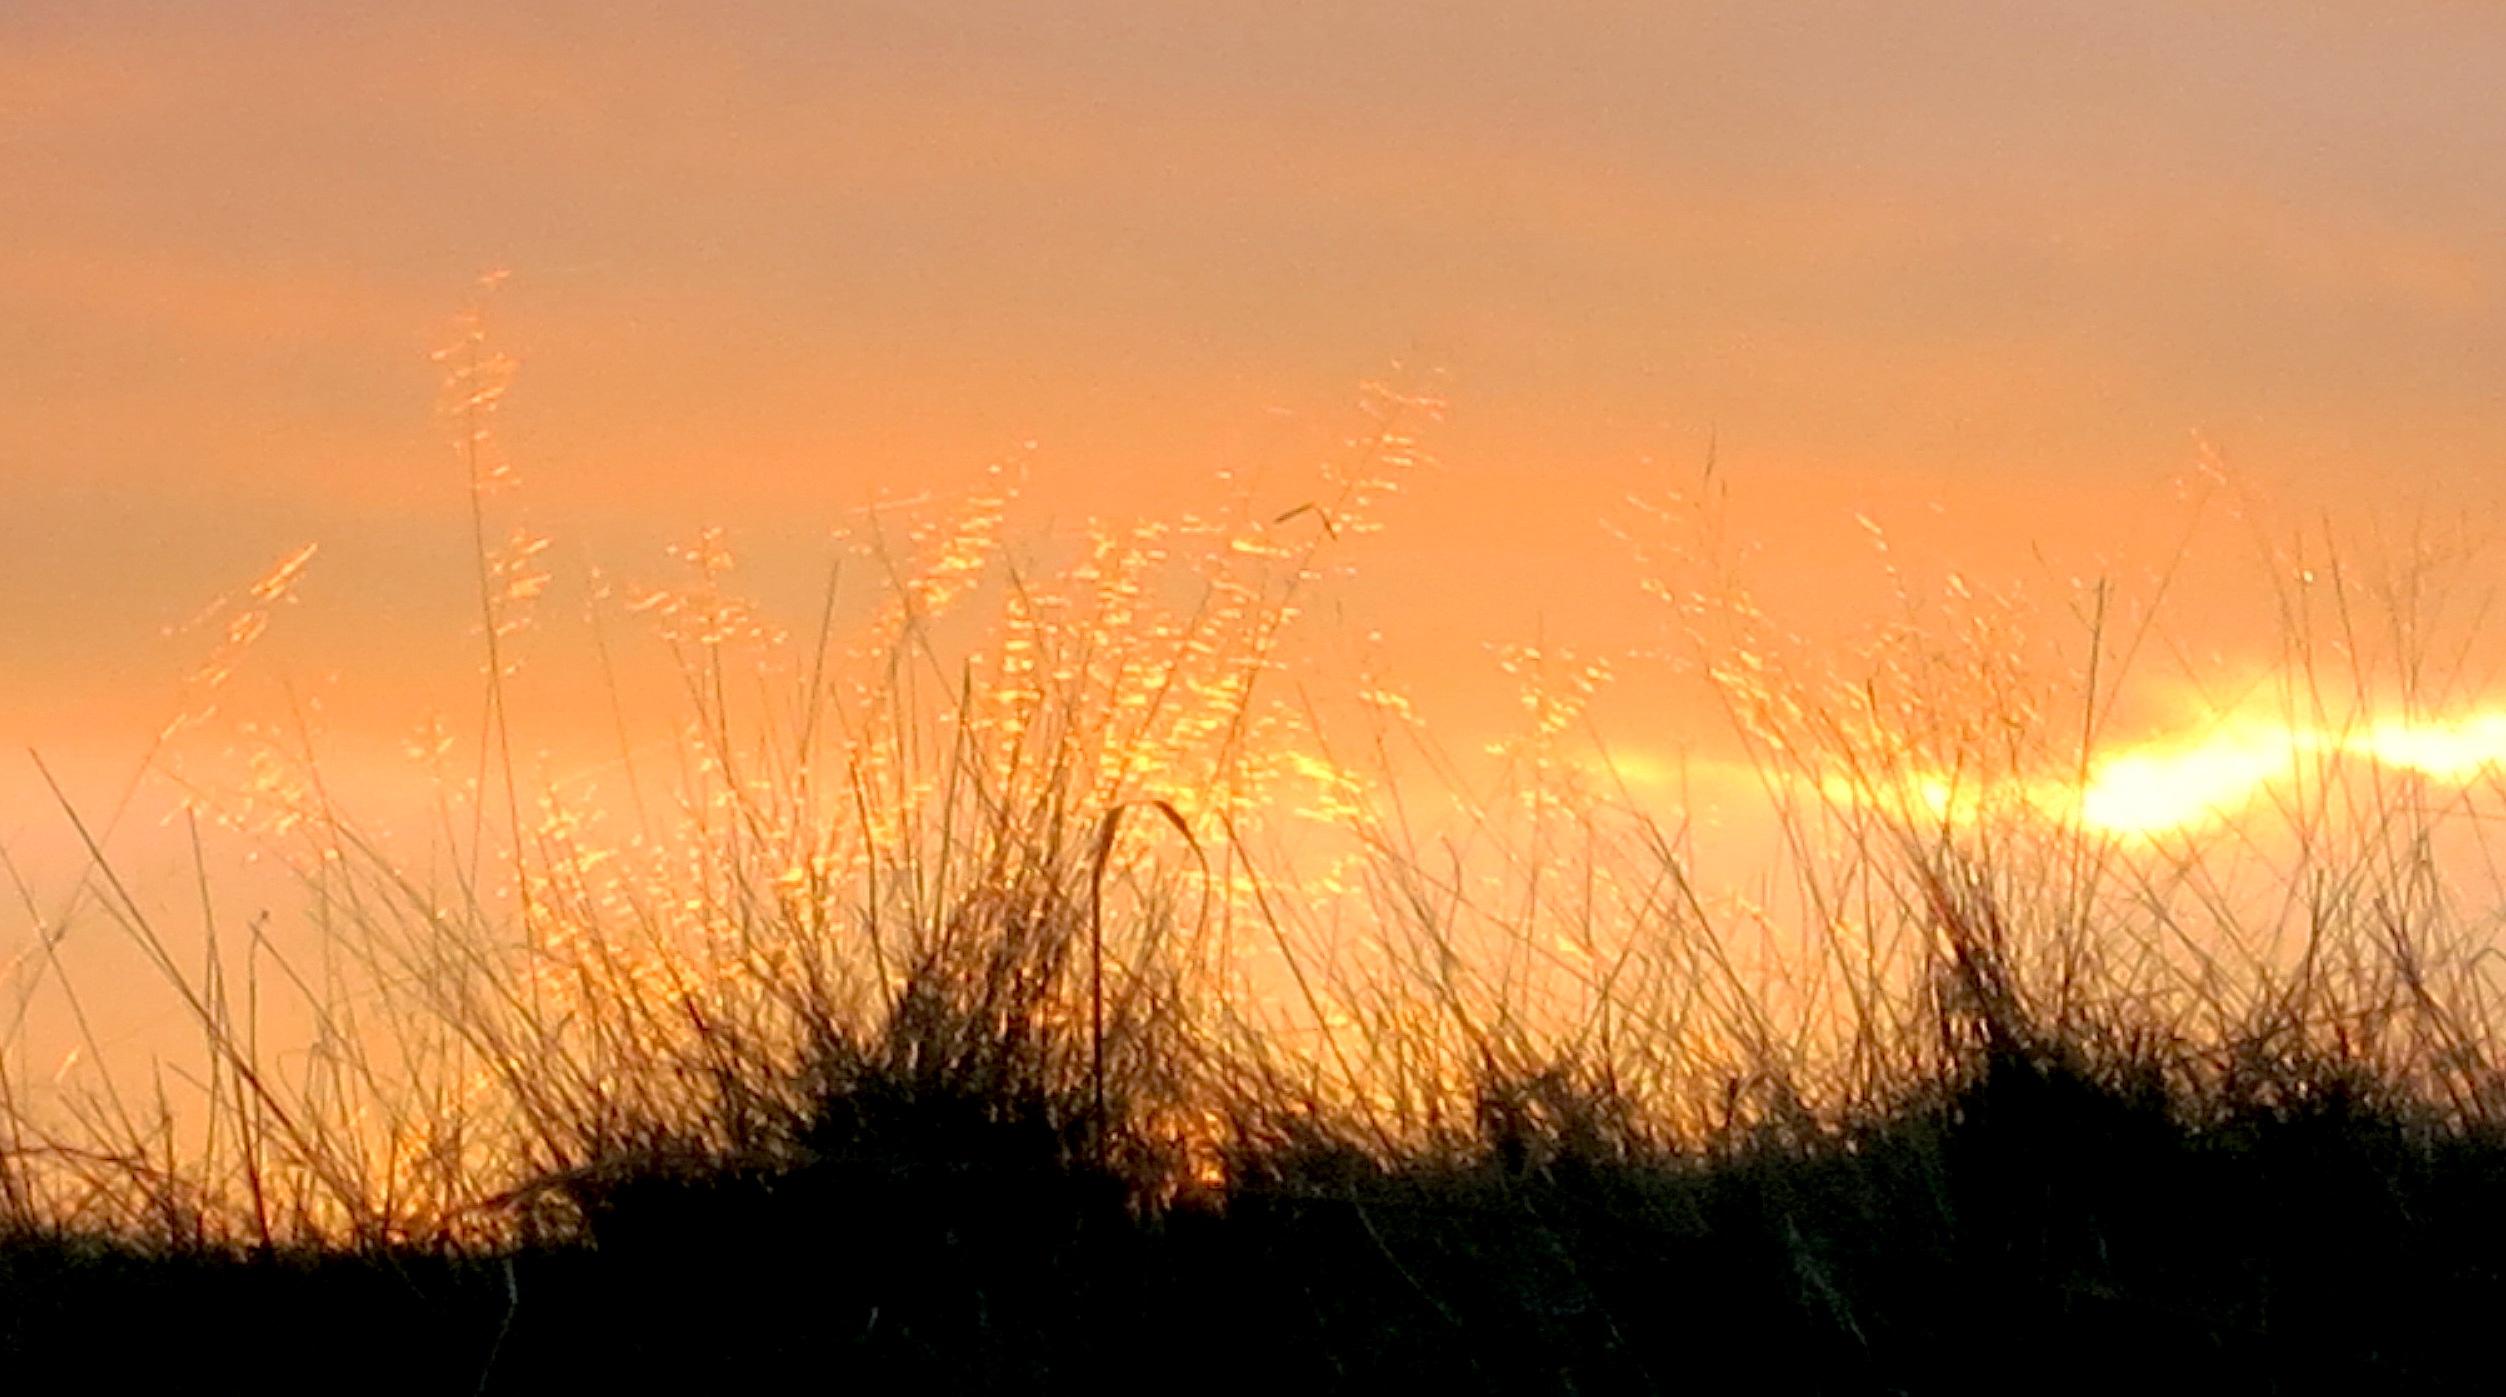 sunset111142